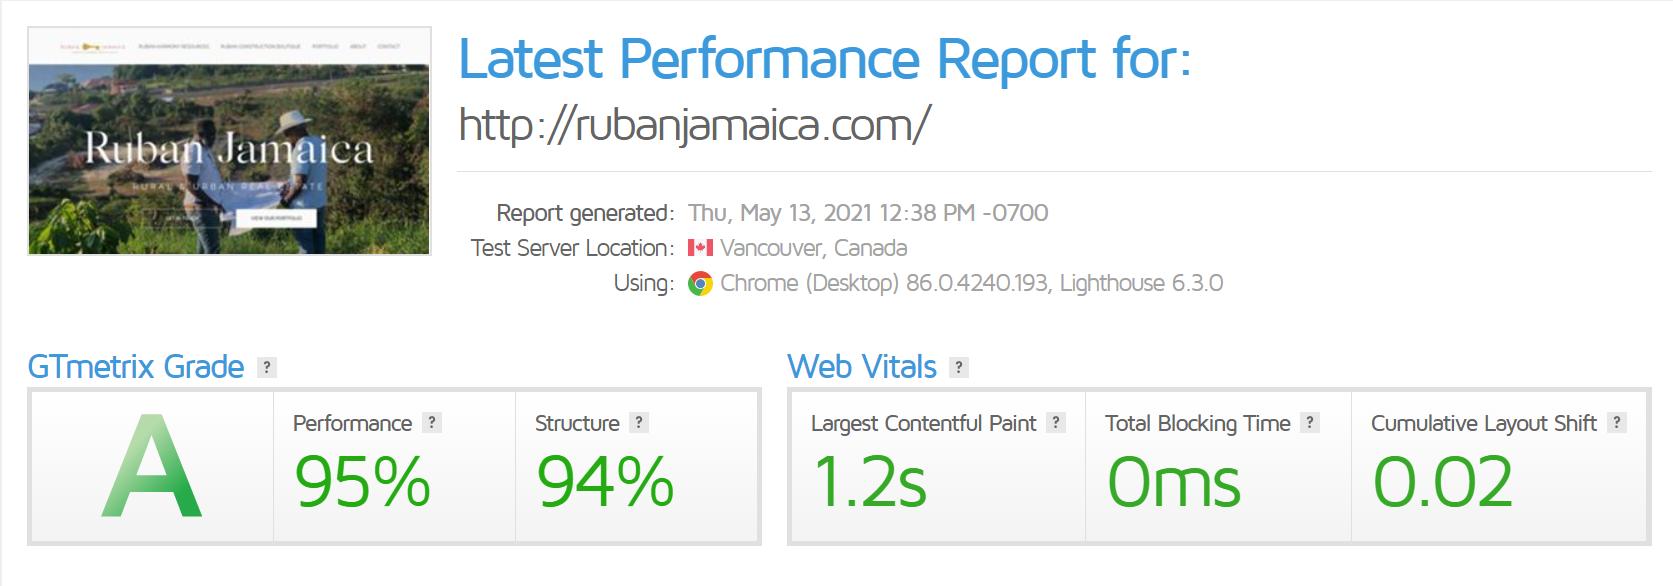 Ruban Jamaica's GTMetrix score